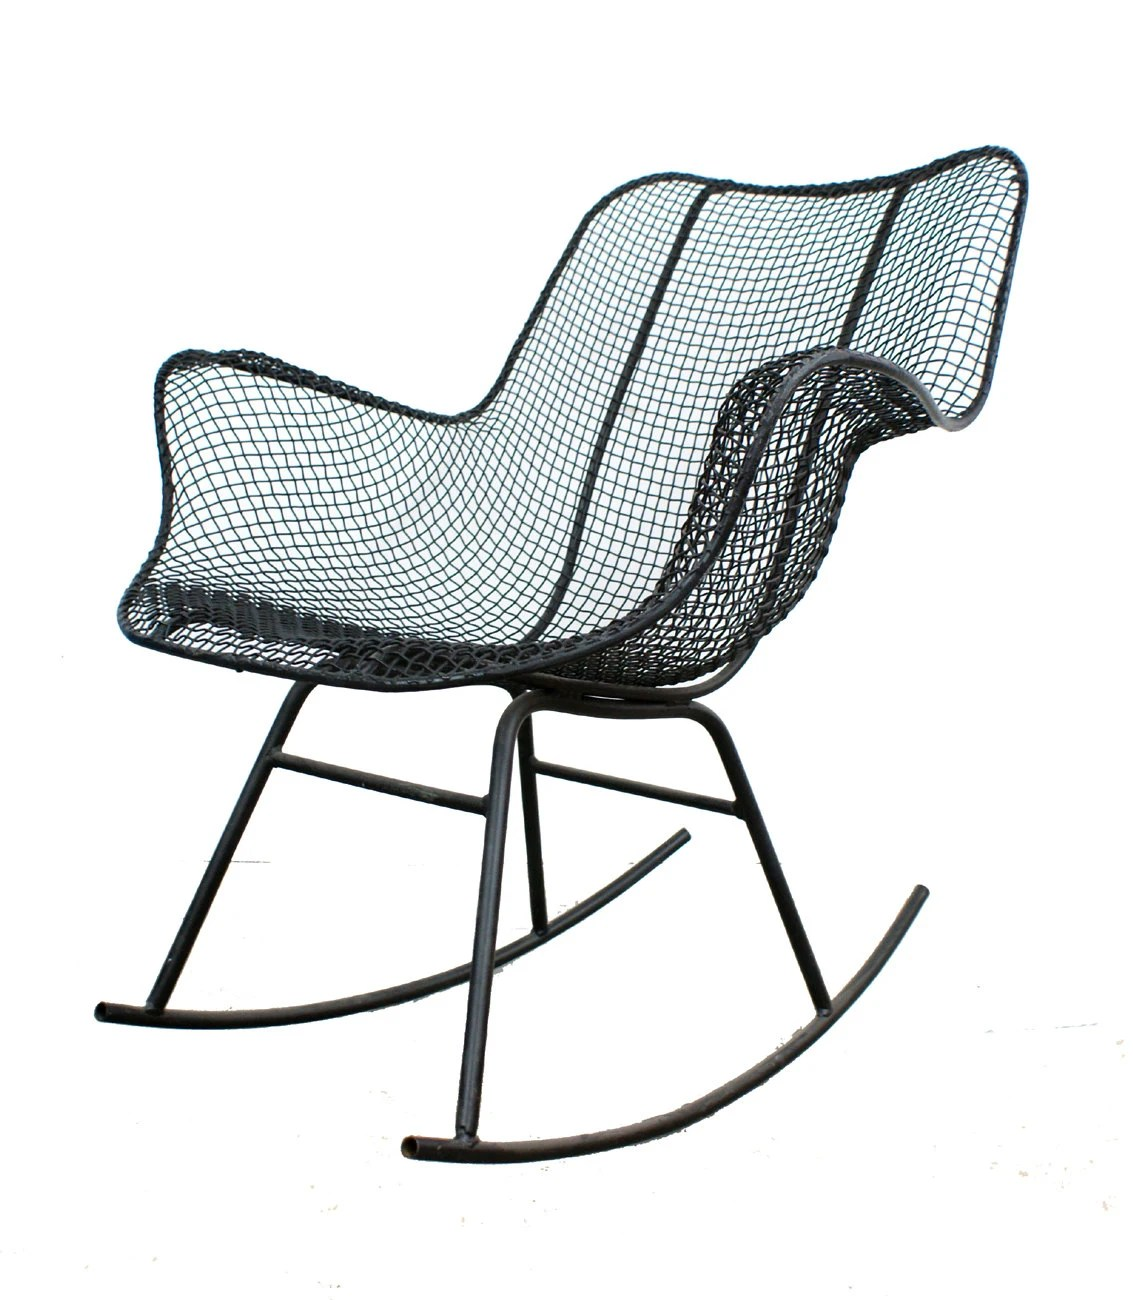 modern rocking chair singapore patio sling end caps woodard sculptura mid century eames on